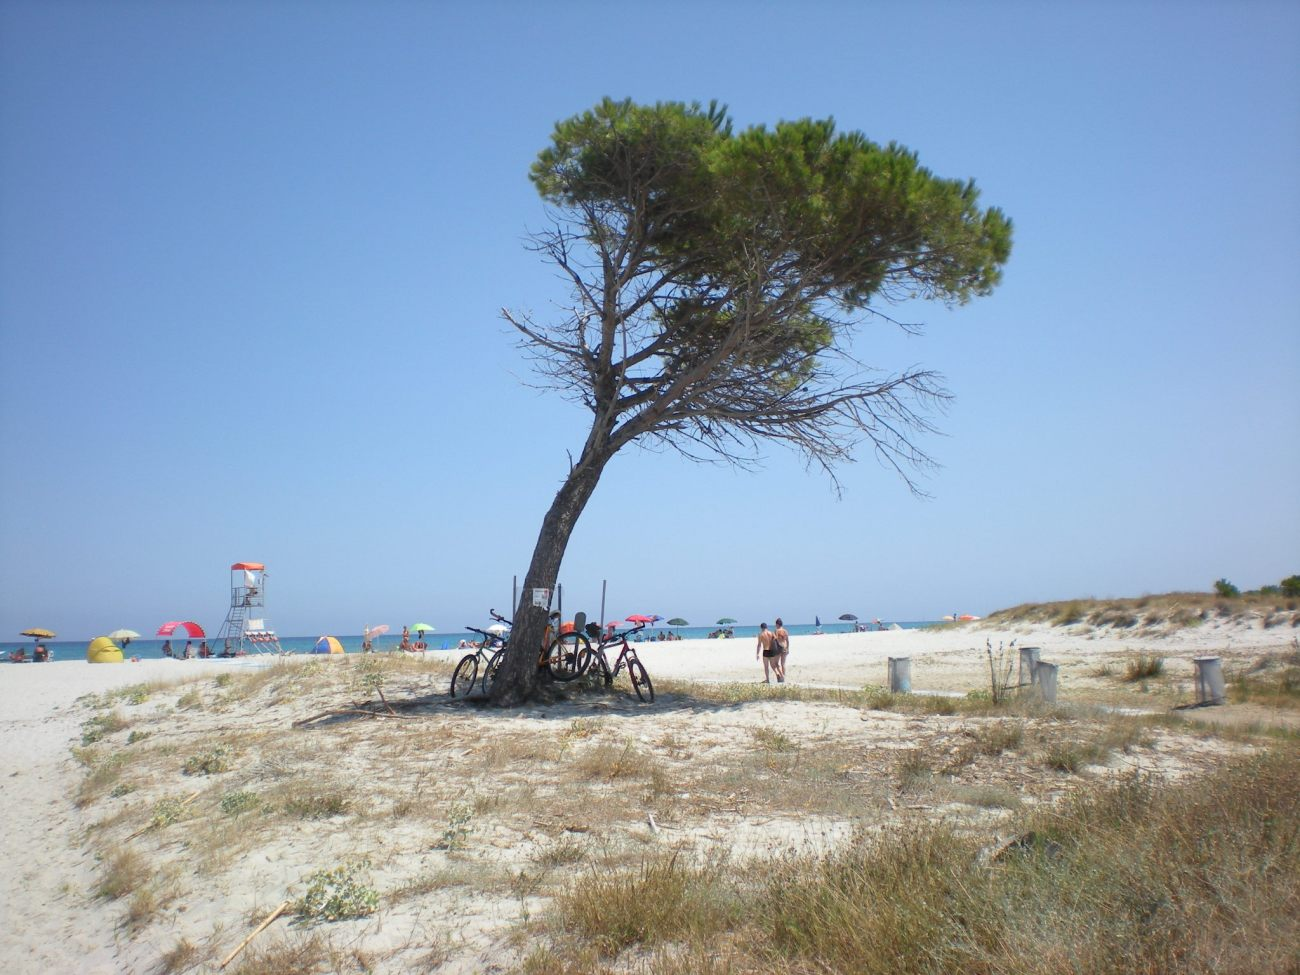 La calletta beach, San Teodoro Sardinia